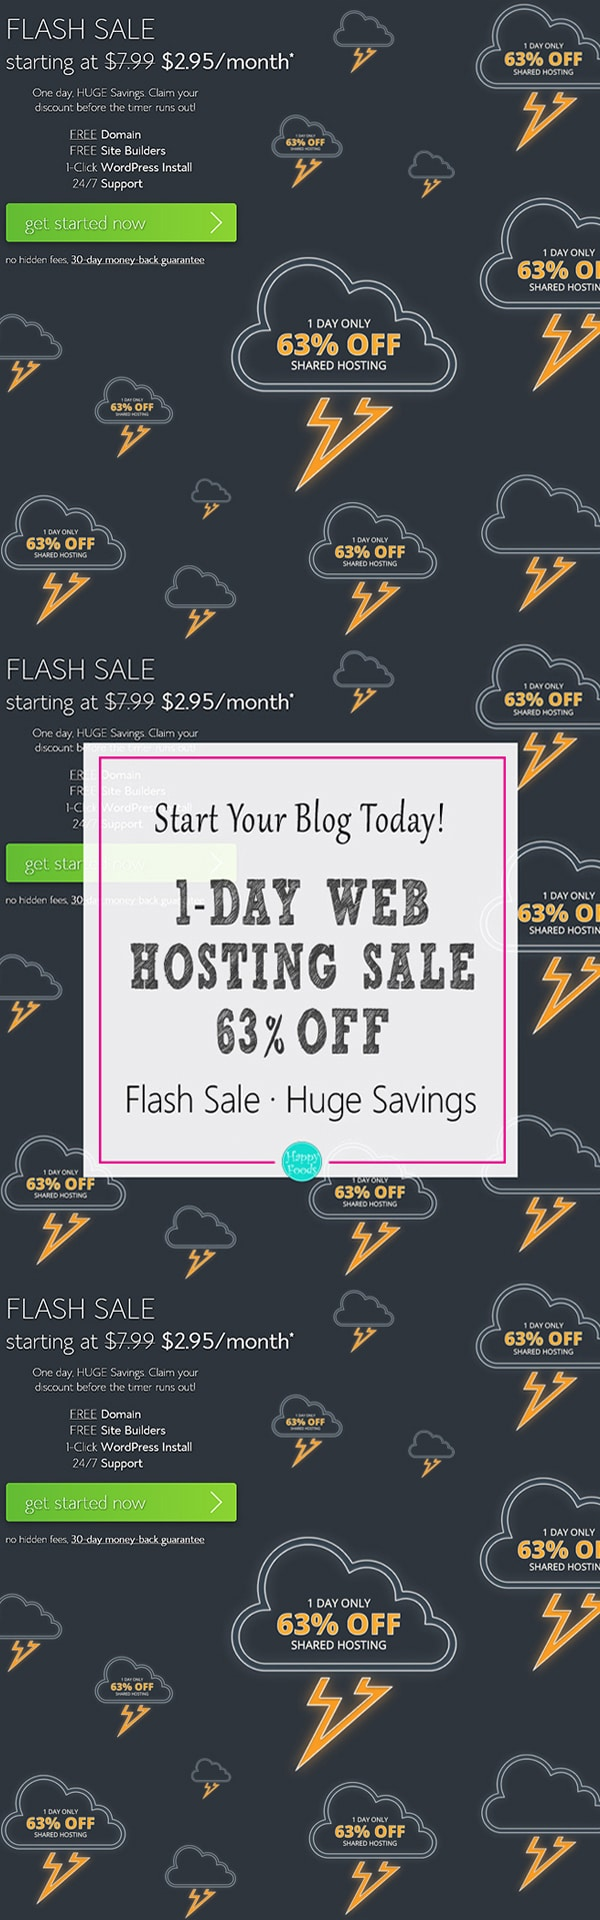 Bluehost Web Hosting 1 Day Flash Sale Huge Discount